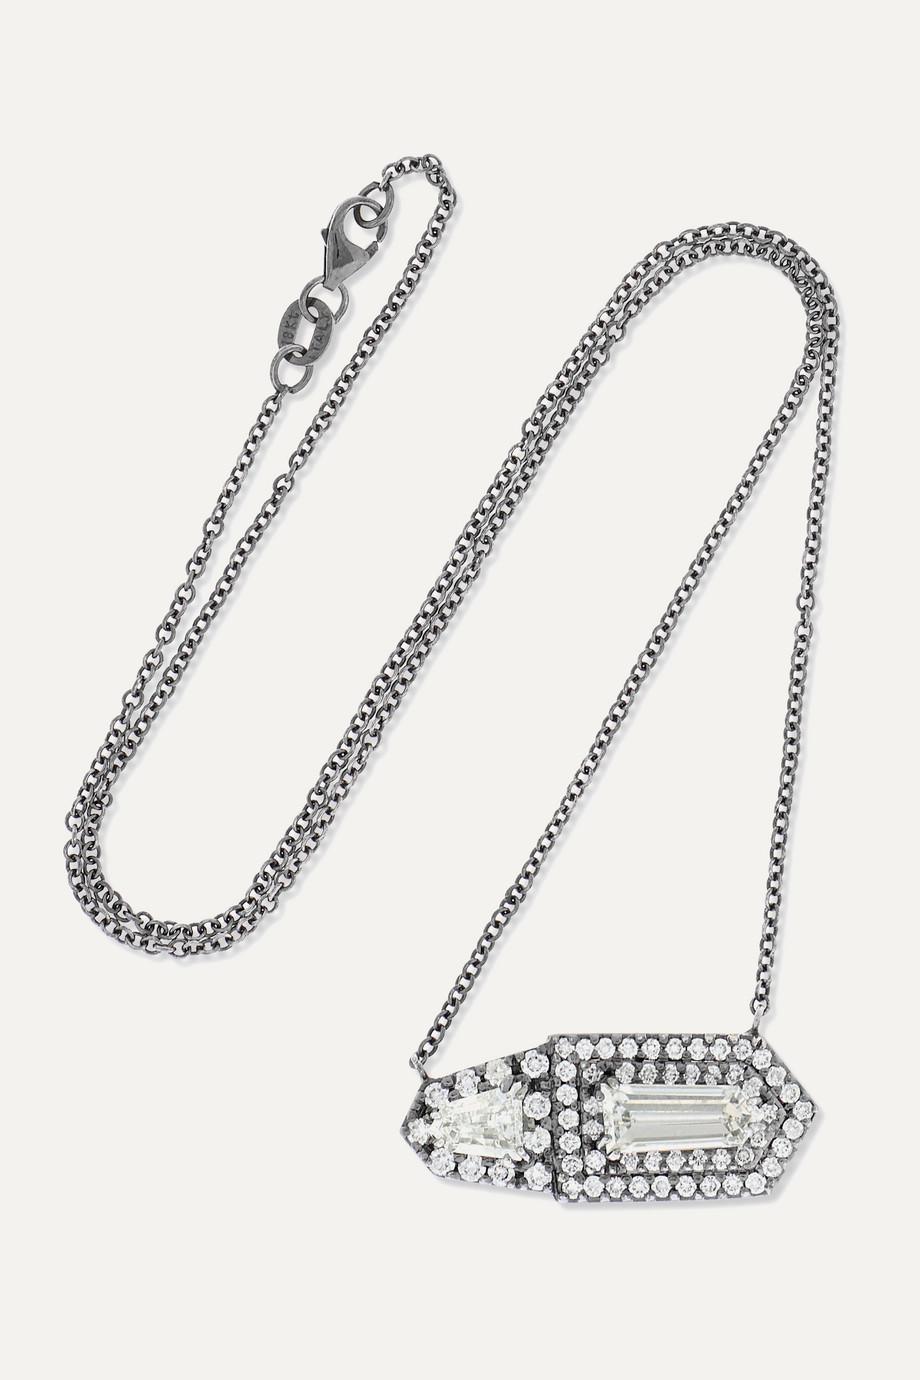 Kimberly McDonald 18-karat blackened white gold diamond necklace